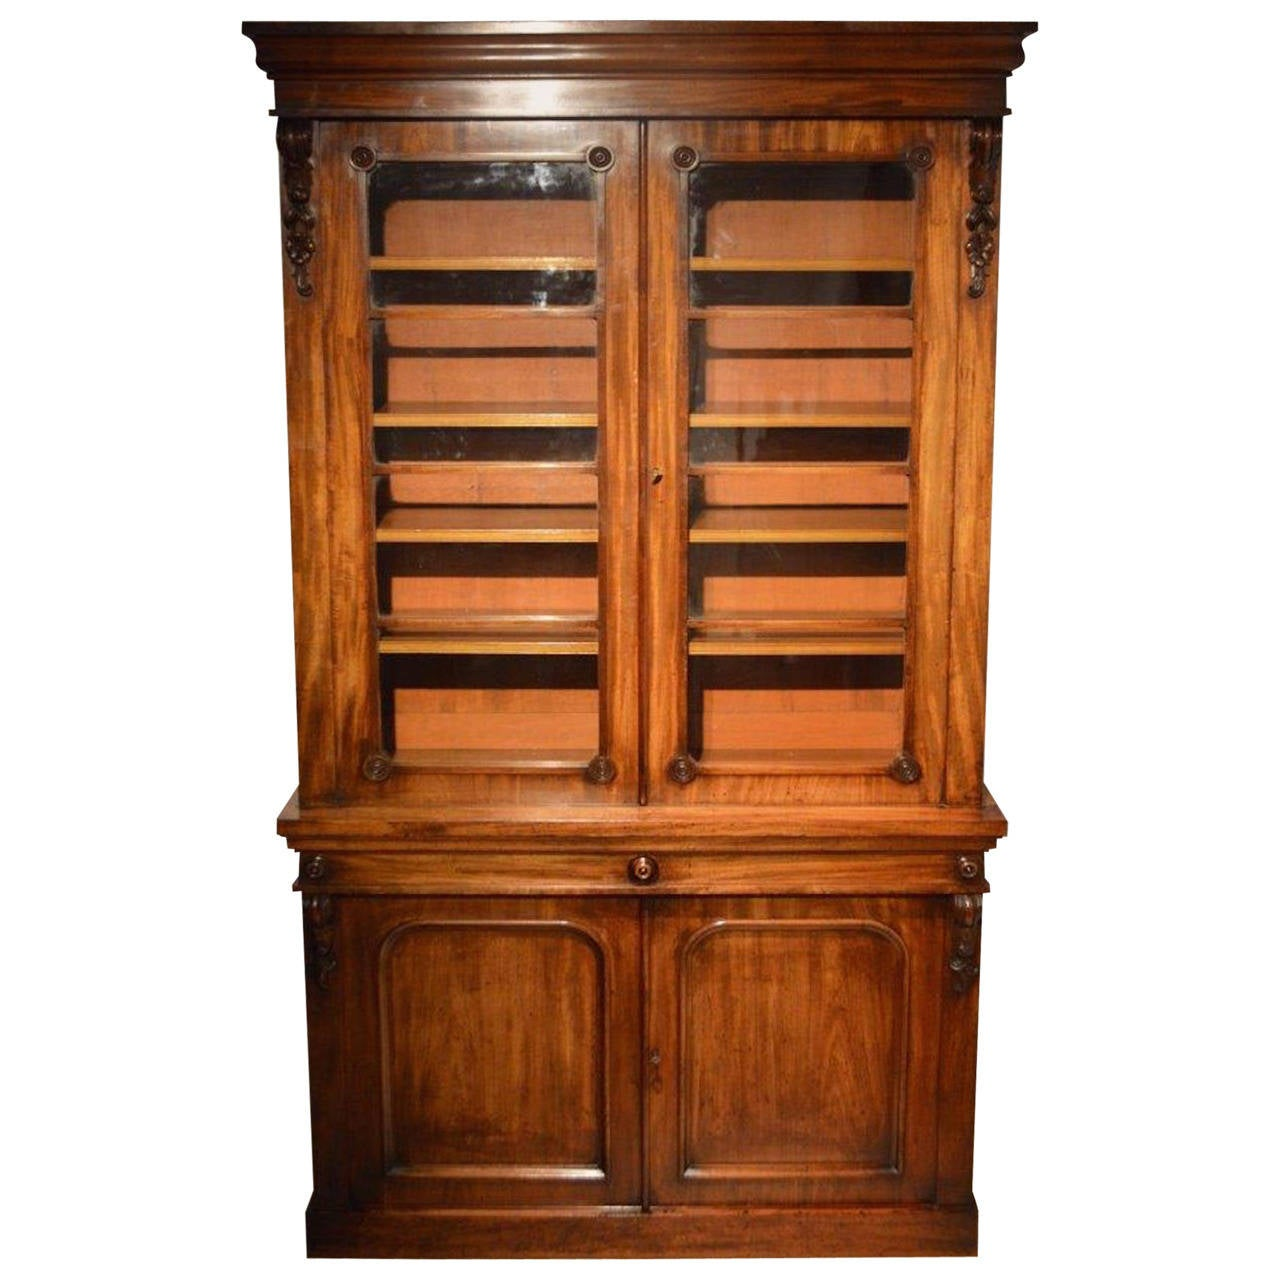 Beautiful Mahogany Victorian Period Antique Two Door